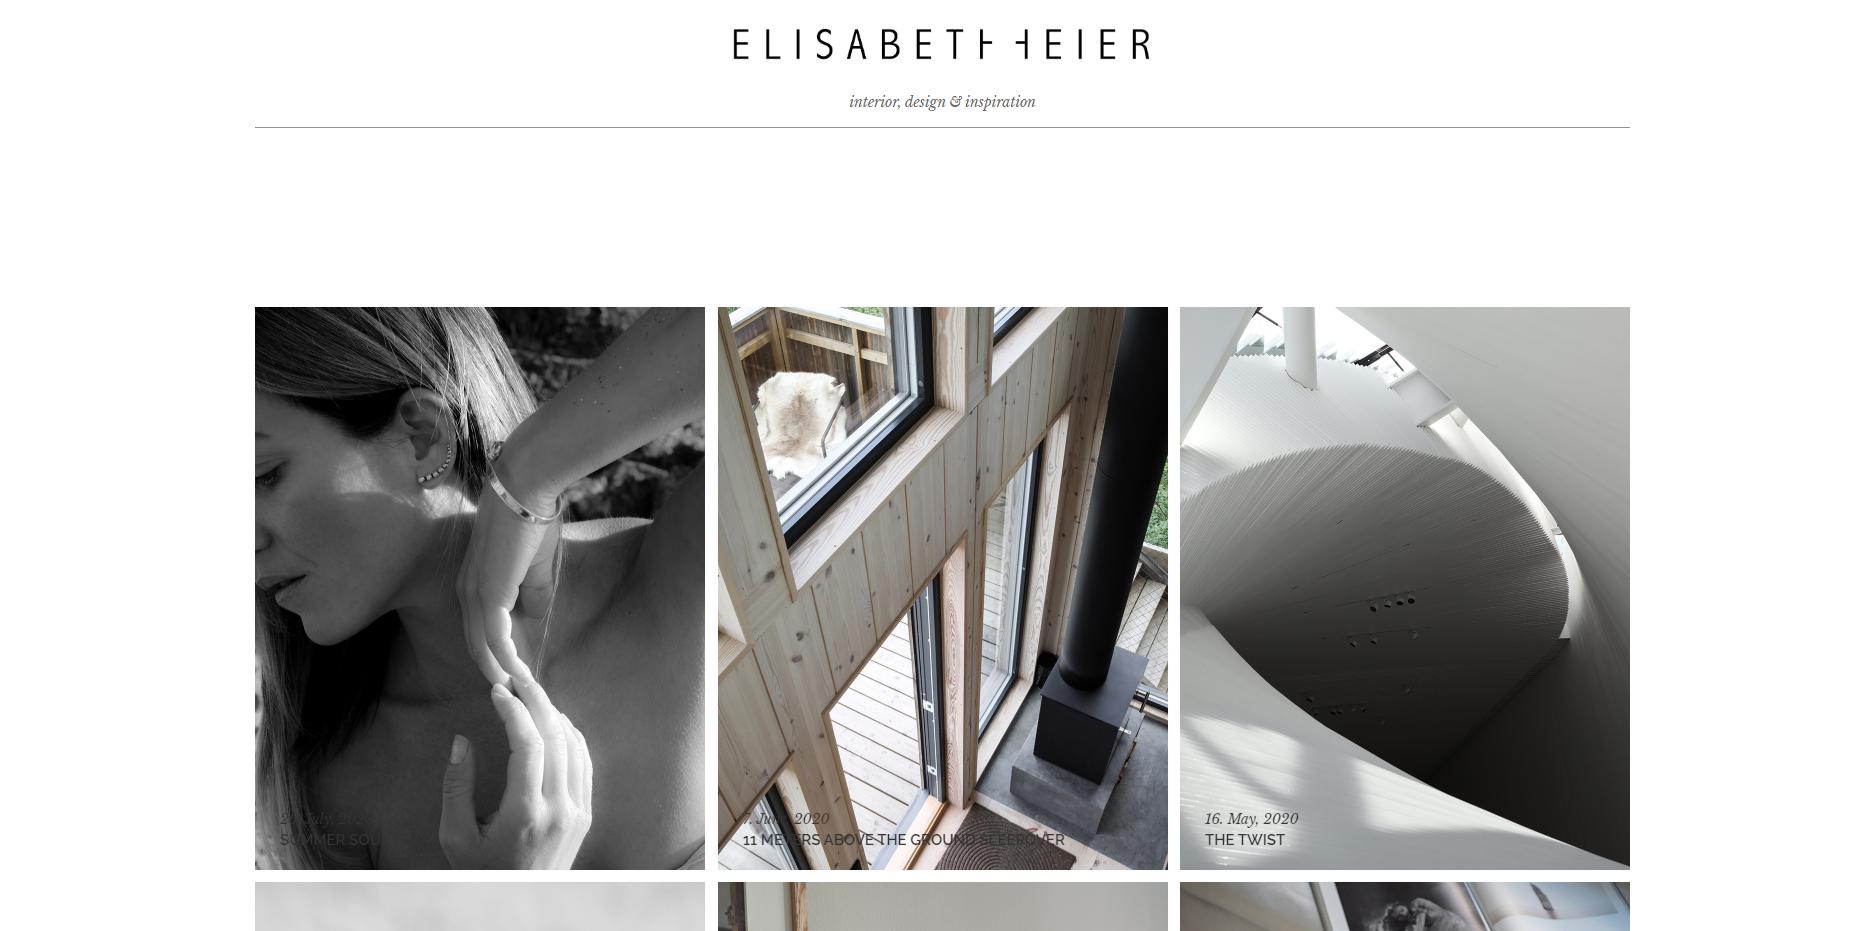 Elisabeth blogin etusivu